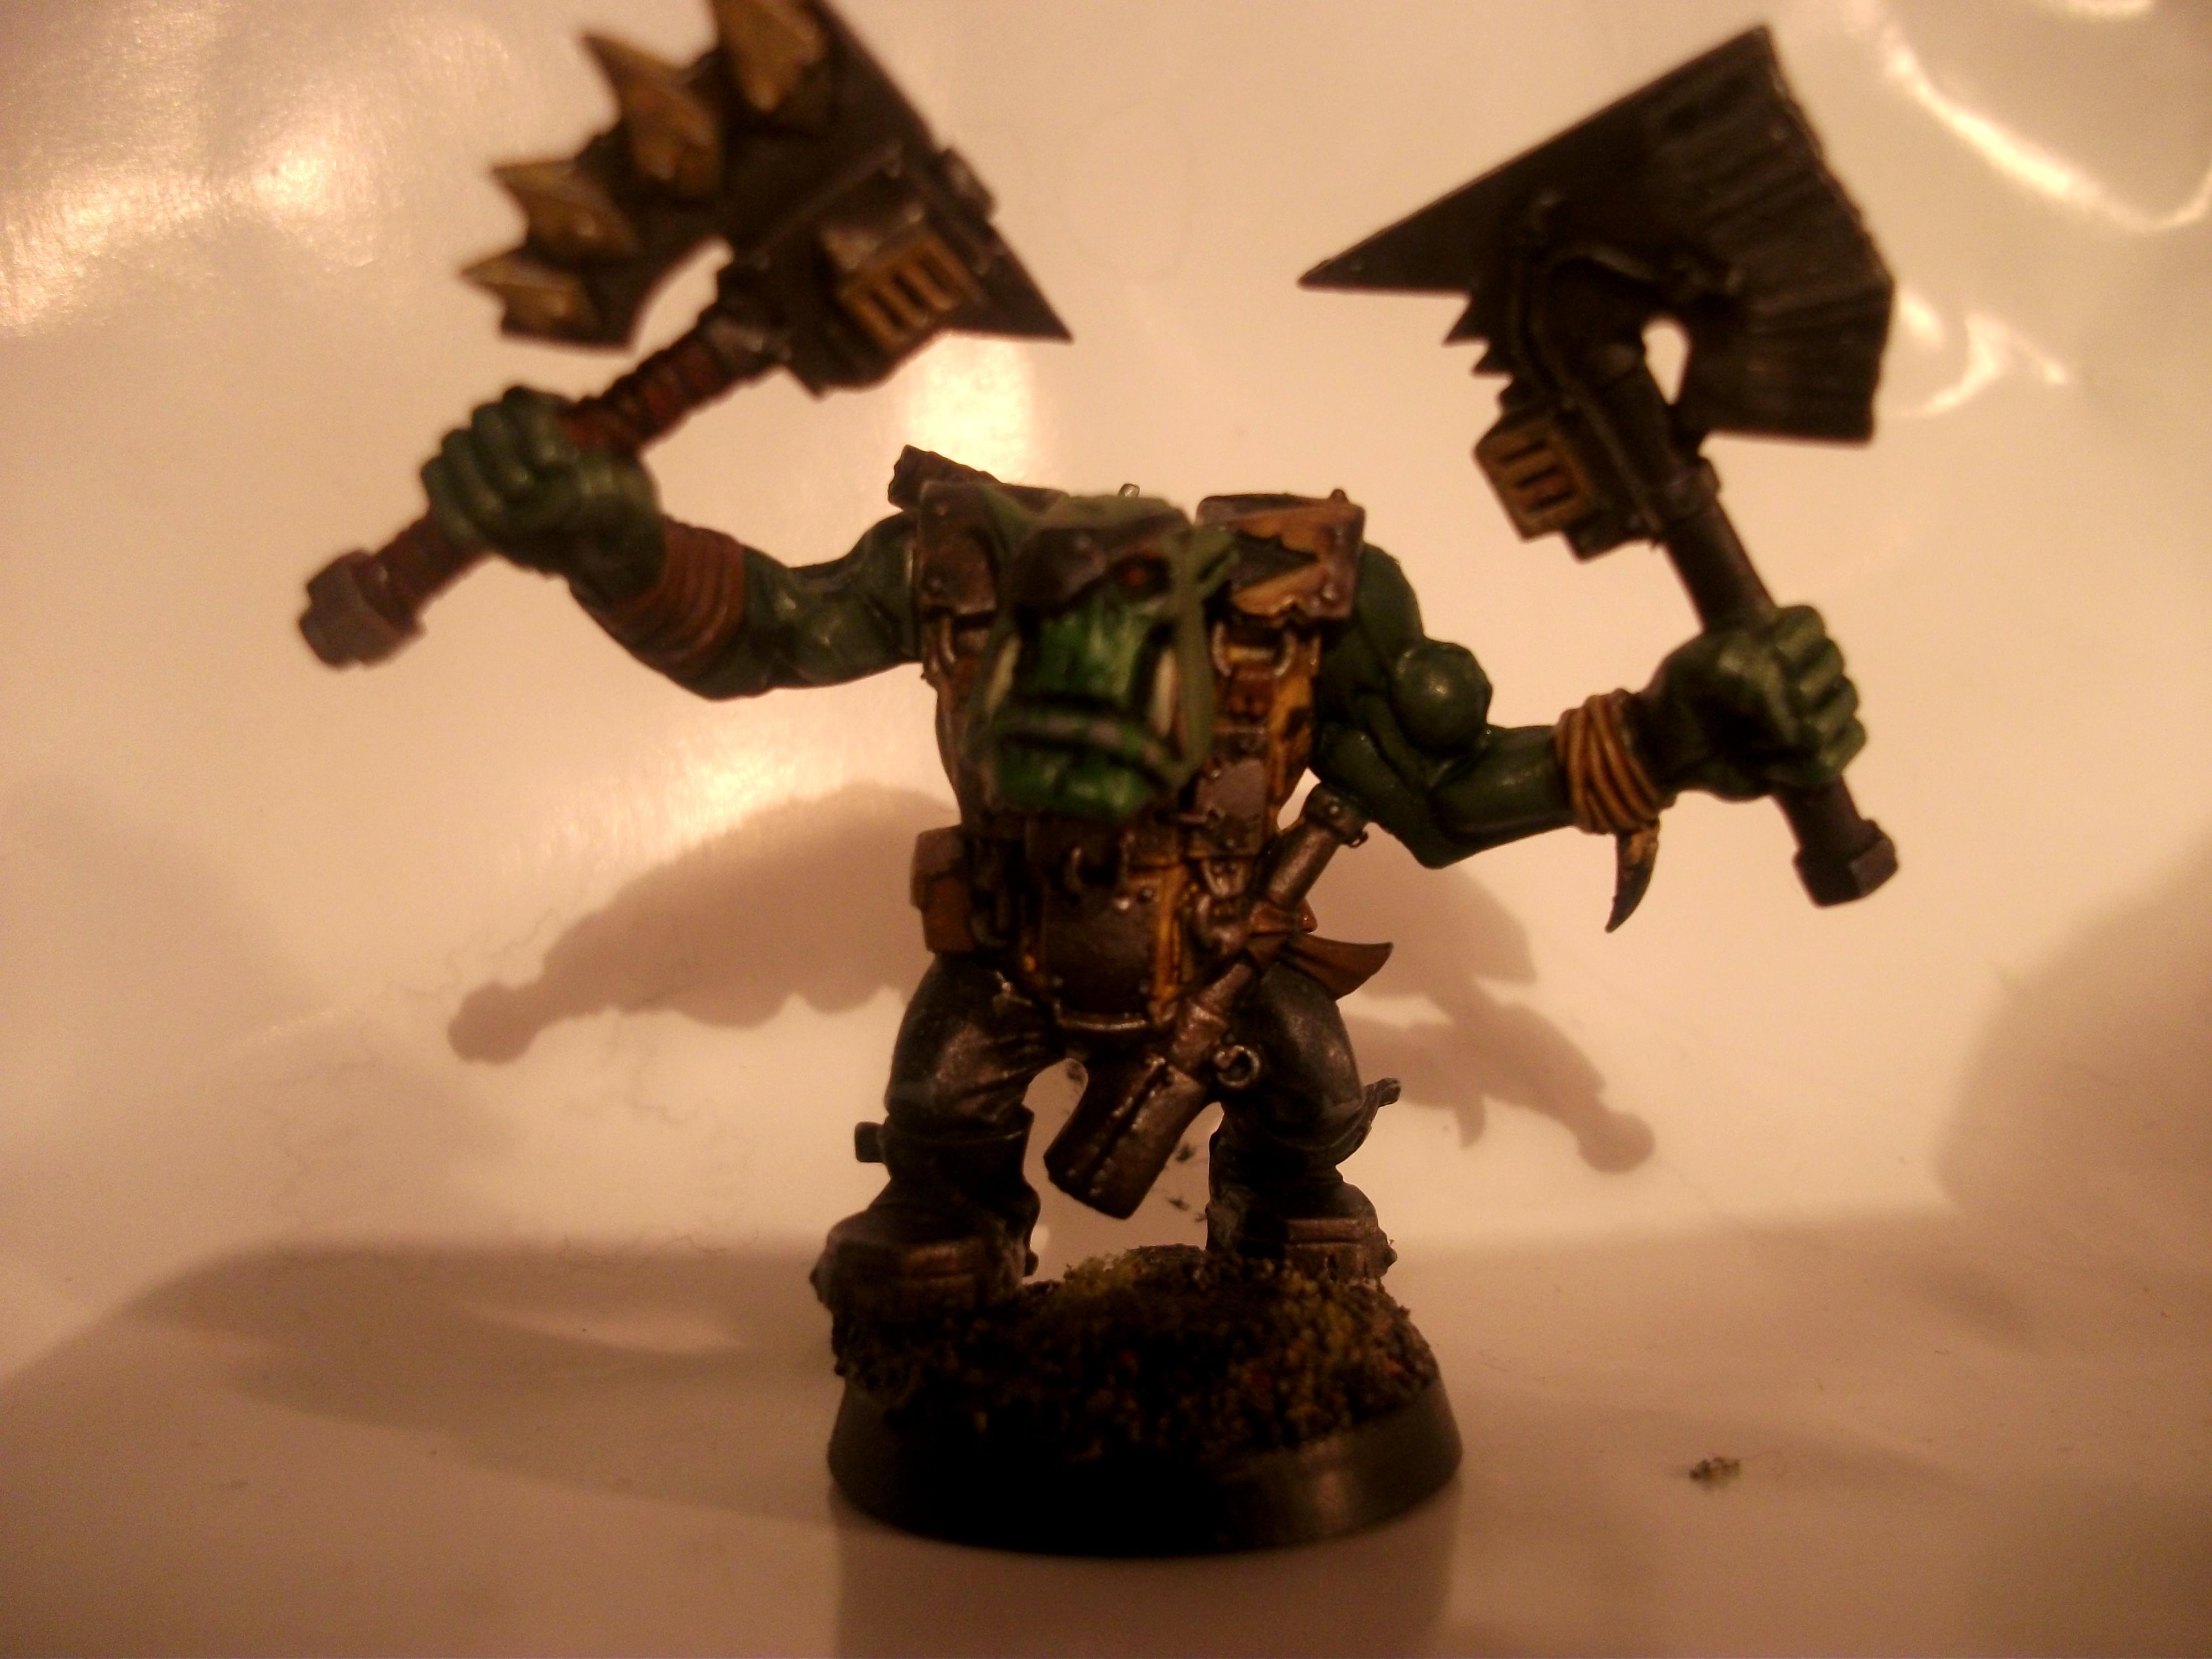 Bad Moonz, Nob, Orks, Warhammer 40,000